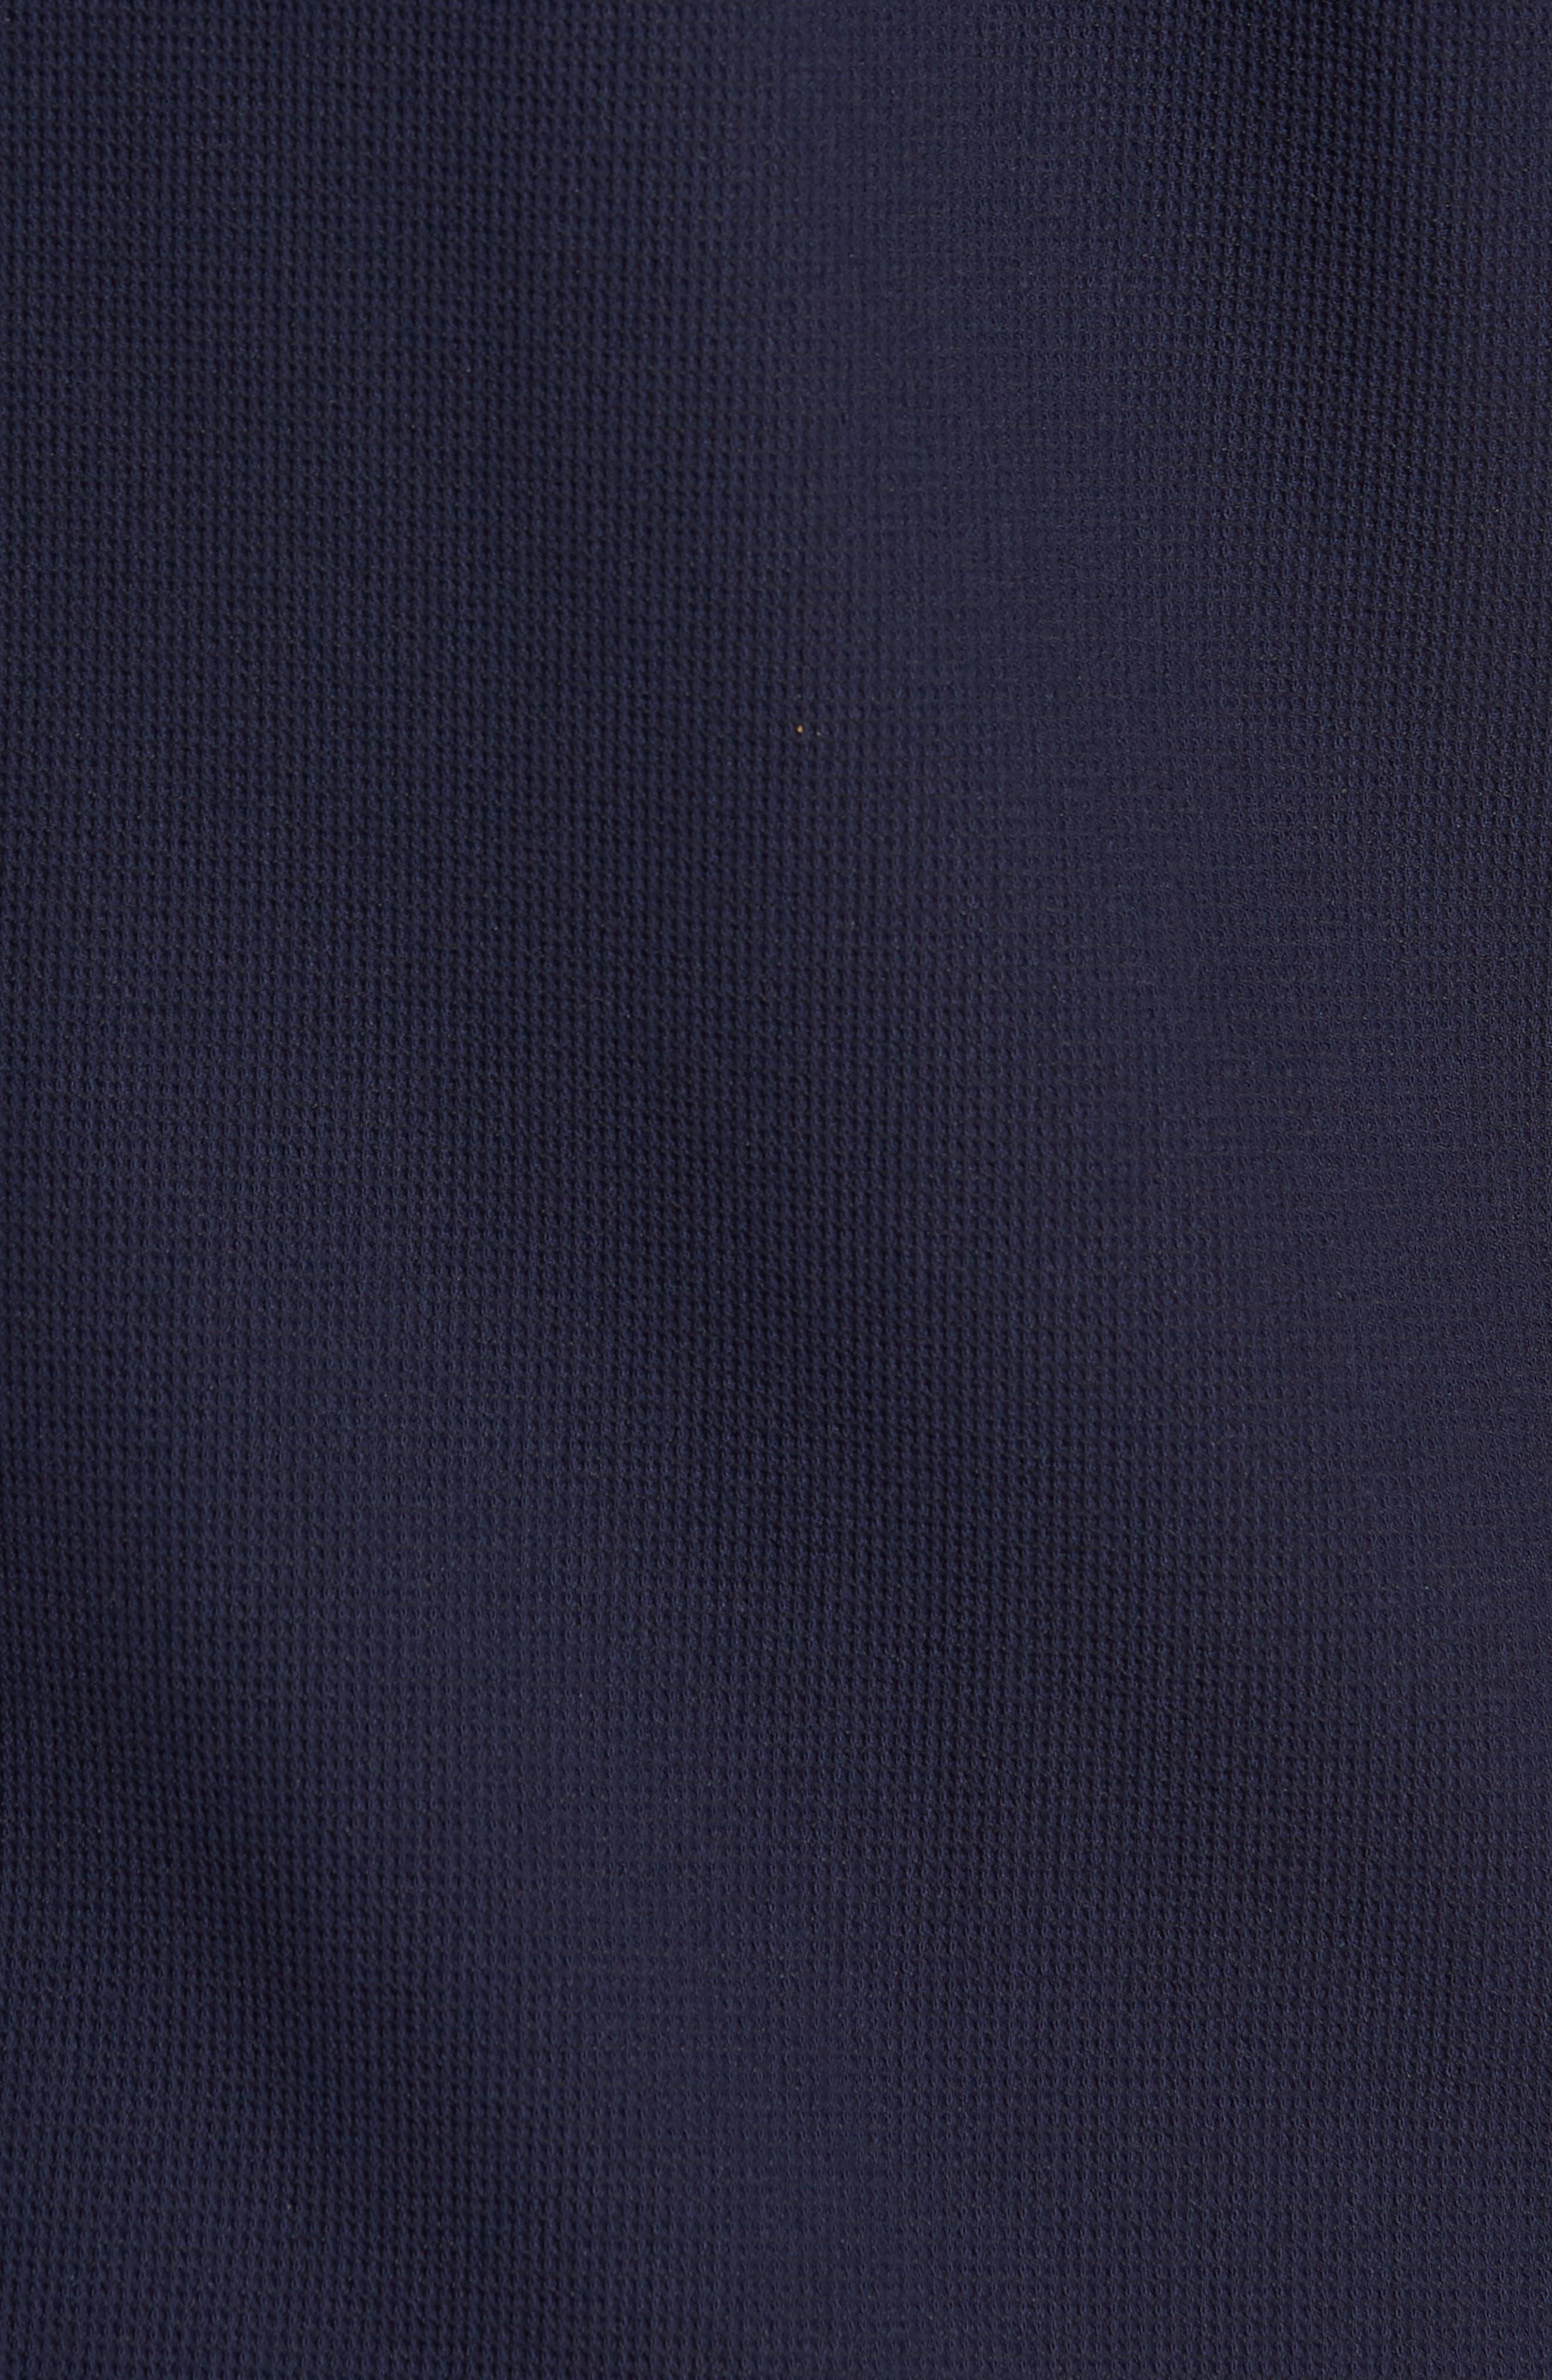 Loretax Trim Fit Stretch Knit Sport Shirt,                             Alternate thumbnail 5, color,